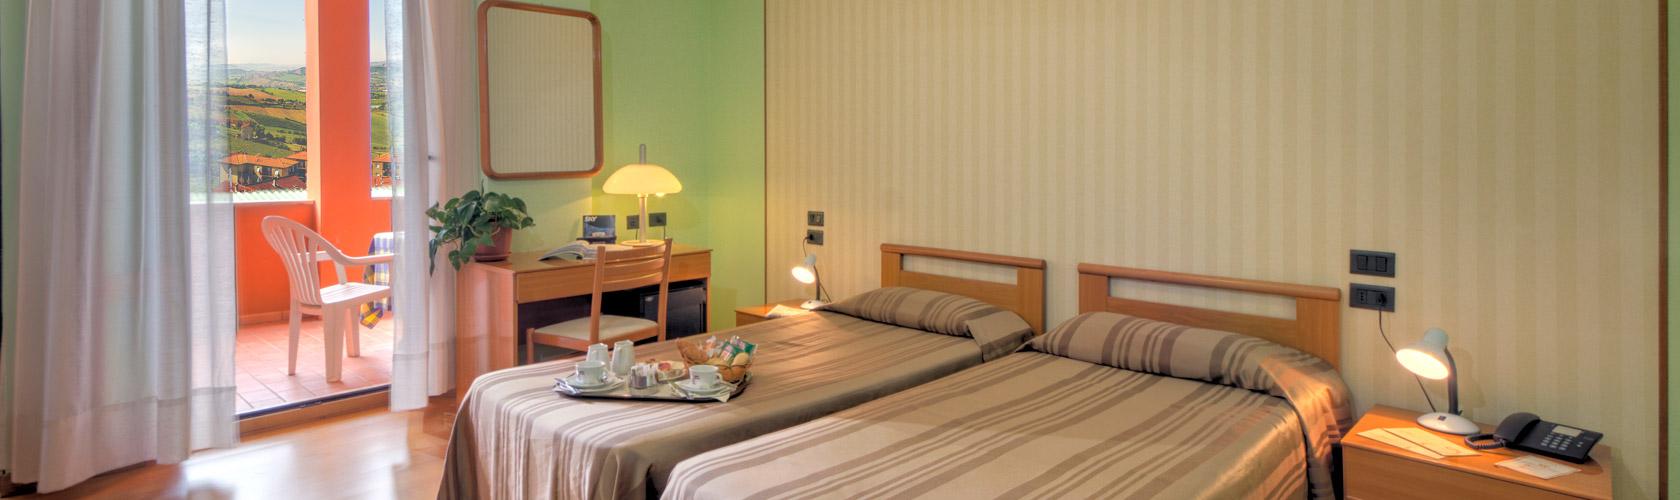 hotel-ancona-sud-02